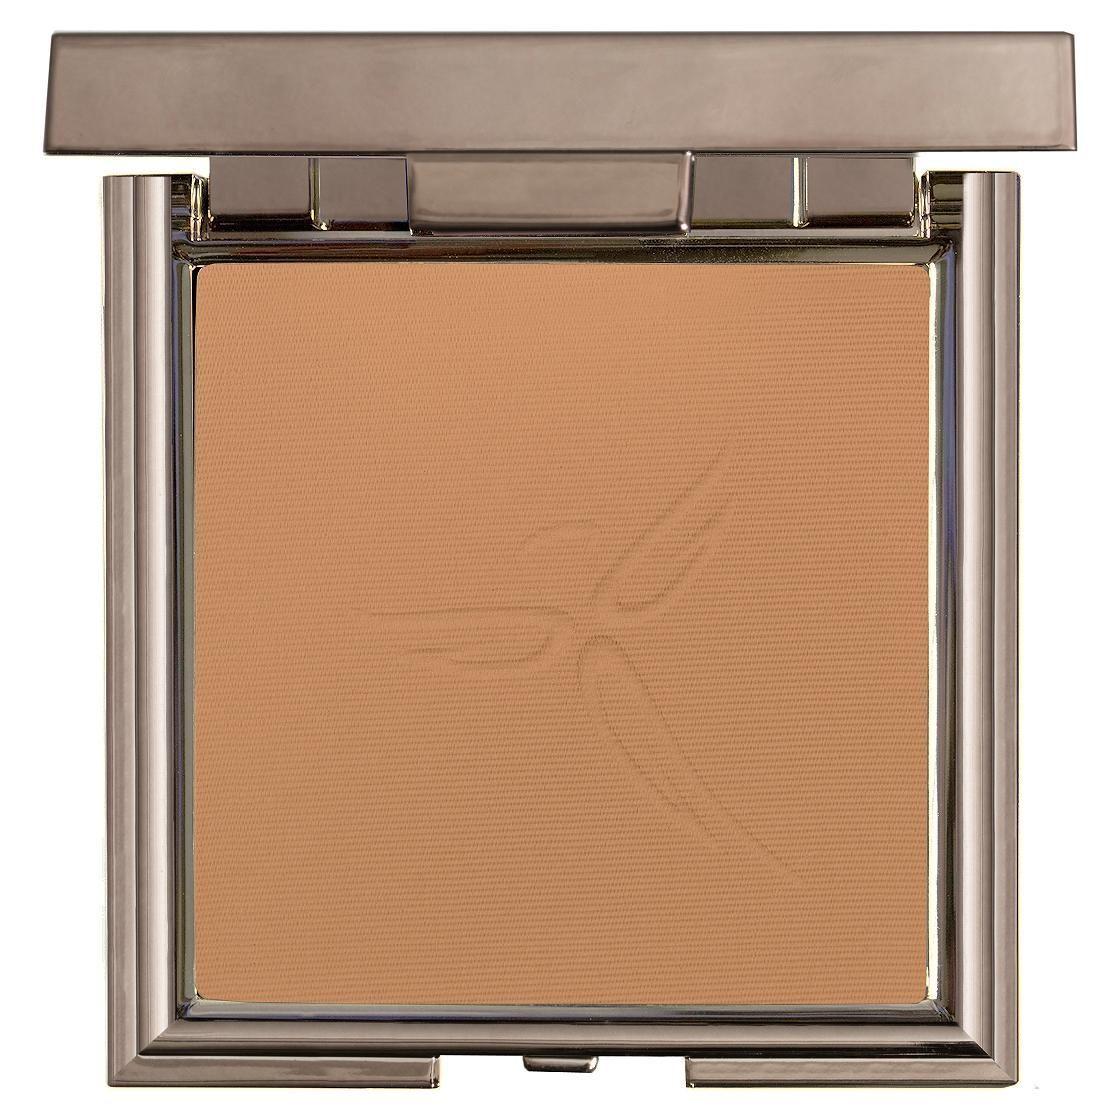 Second Skin Light Diffusing Powder Foundation N°50